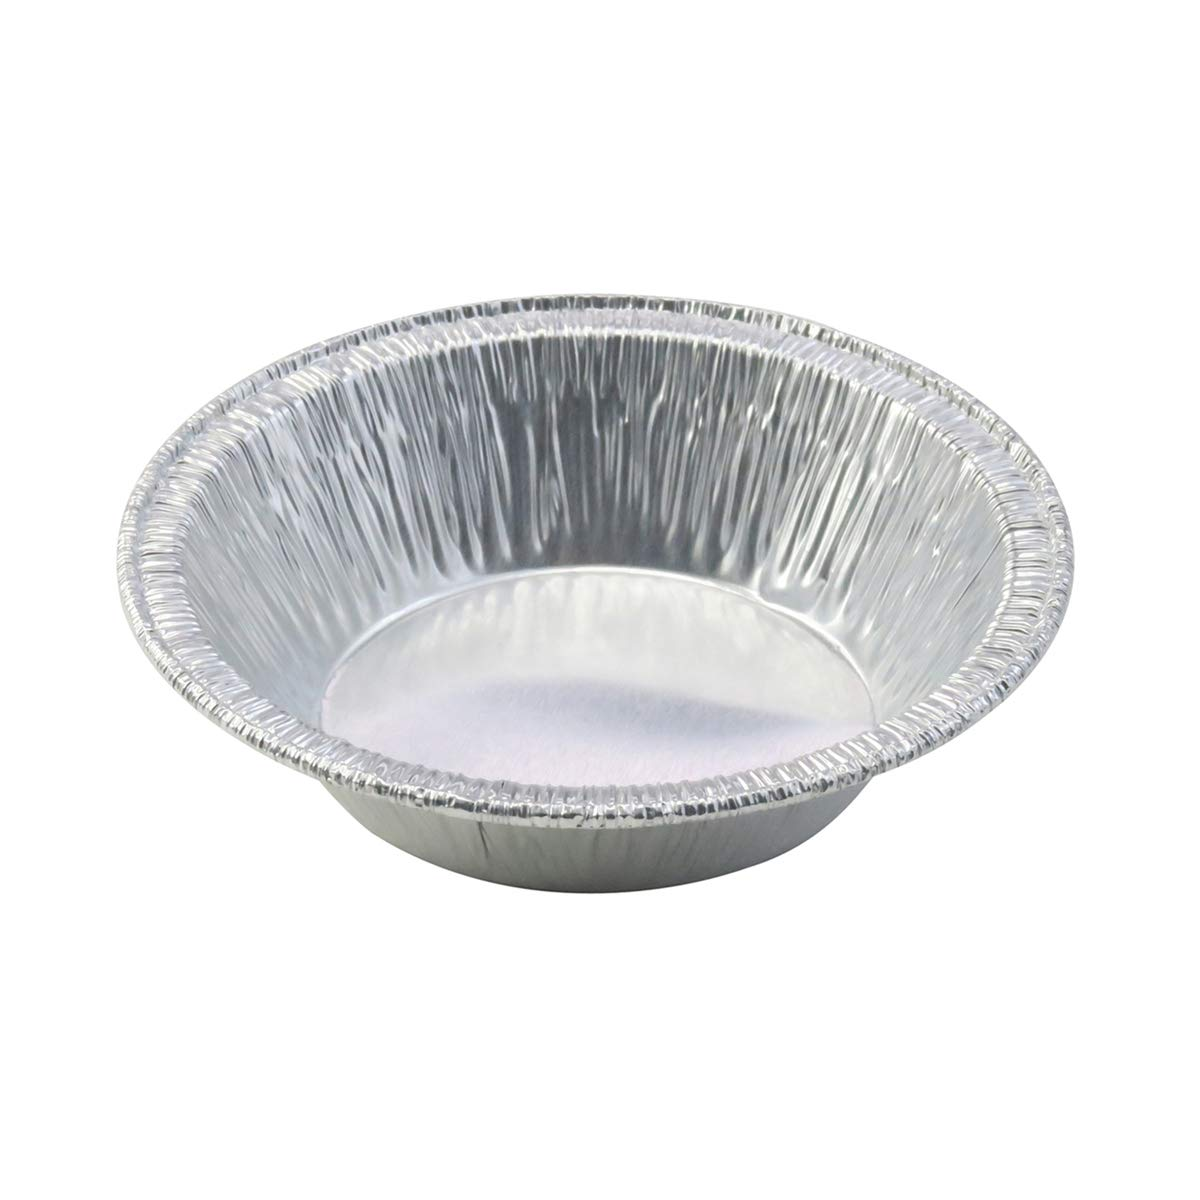 3'' Disposable Aluminum Tart Pans by D & W #A90 (Quantity Pack Options) (1000)